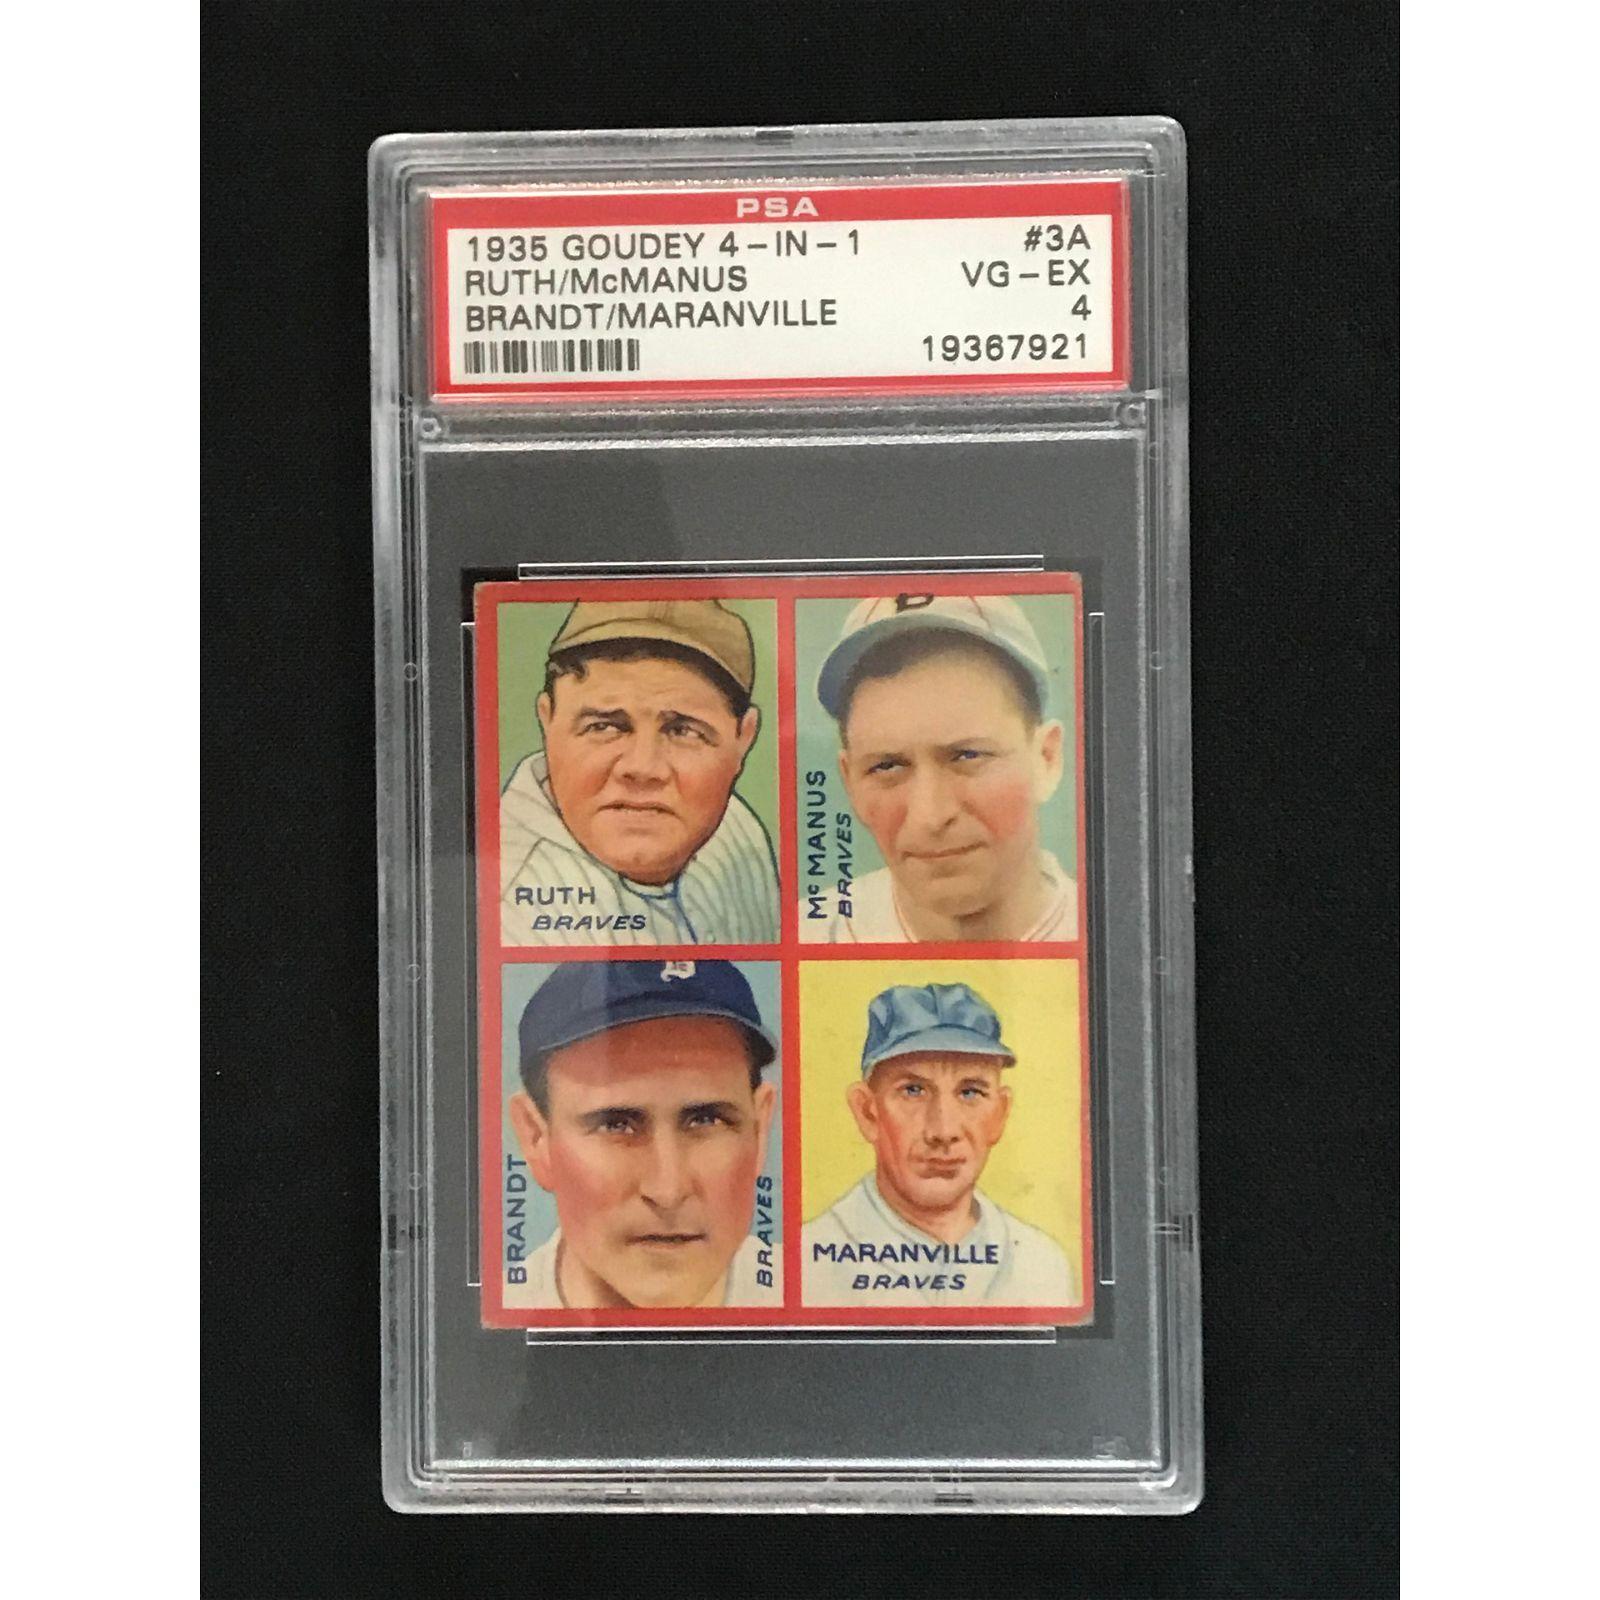 1935 Goudey 4 In 1 Babe Ruth Psa 4